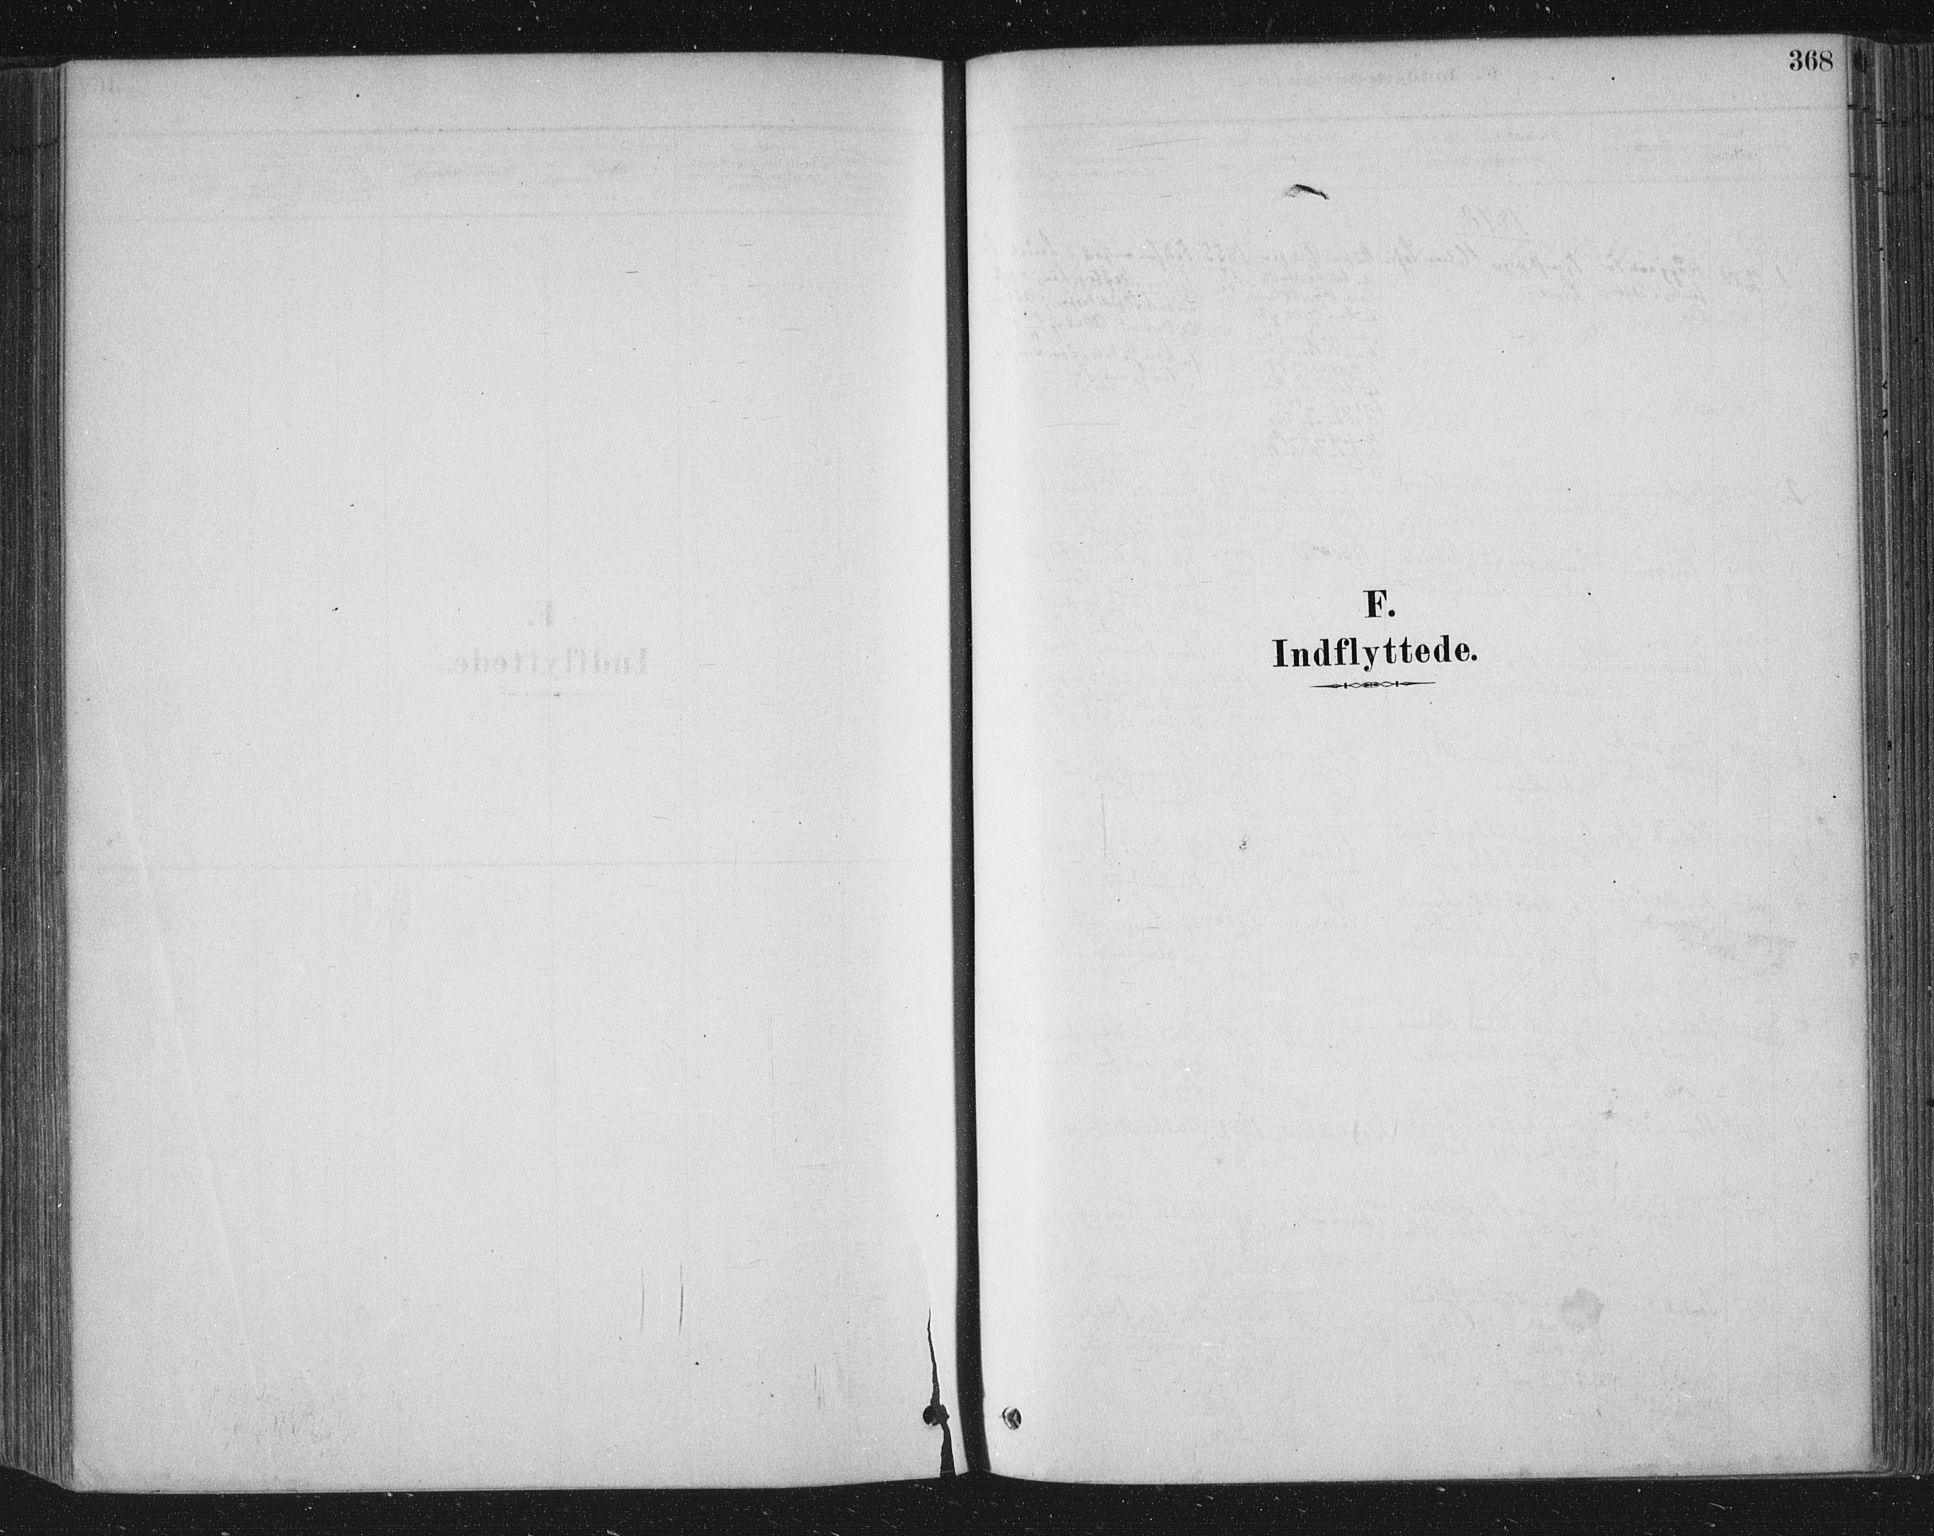 SAKO, Bamble kirkebøker, F/Fa/L0007: Ministerialbok nr. I 7, 1878-1888, s. 368